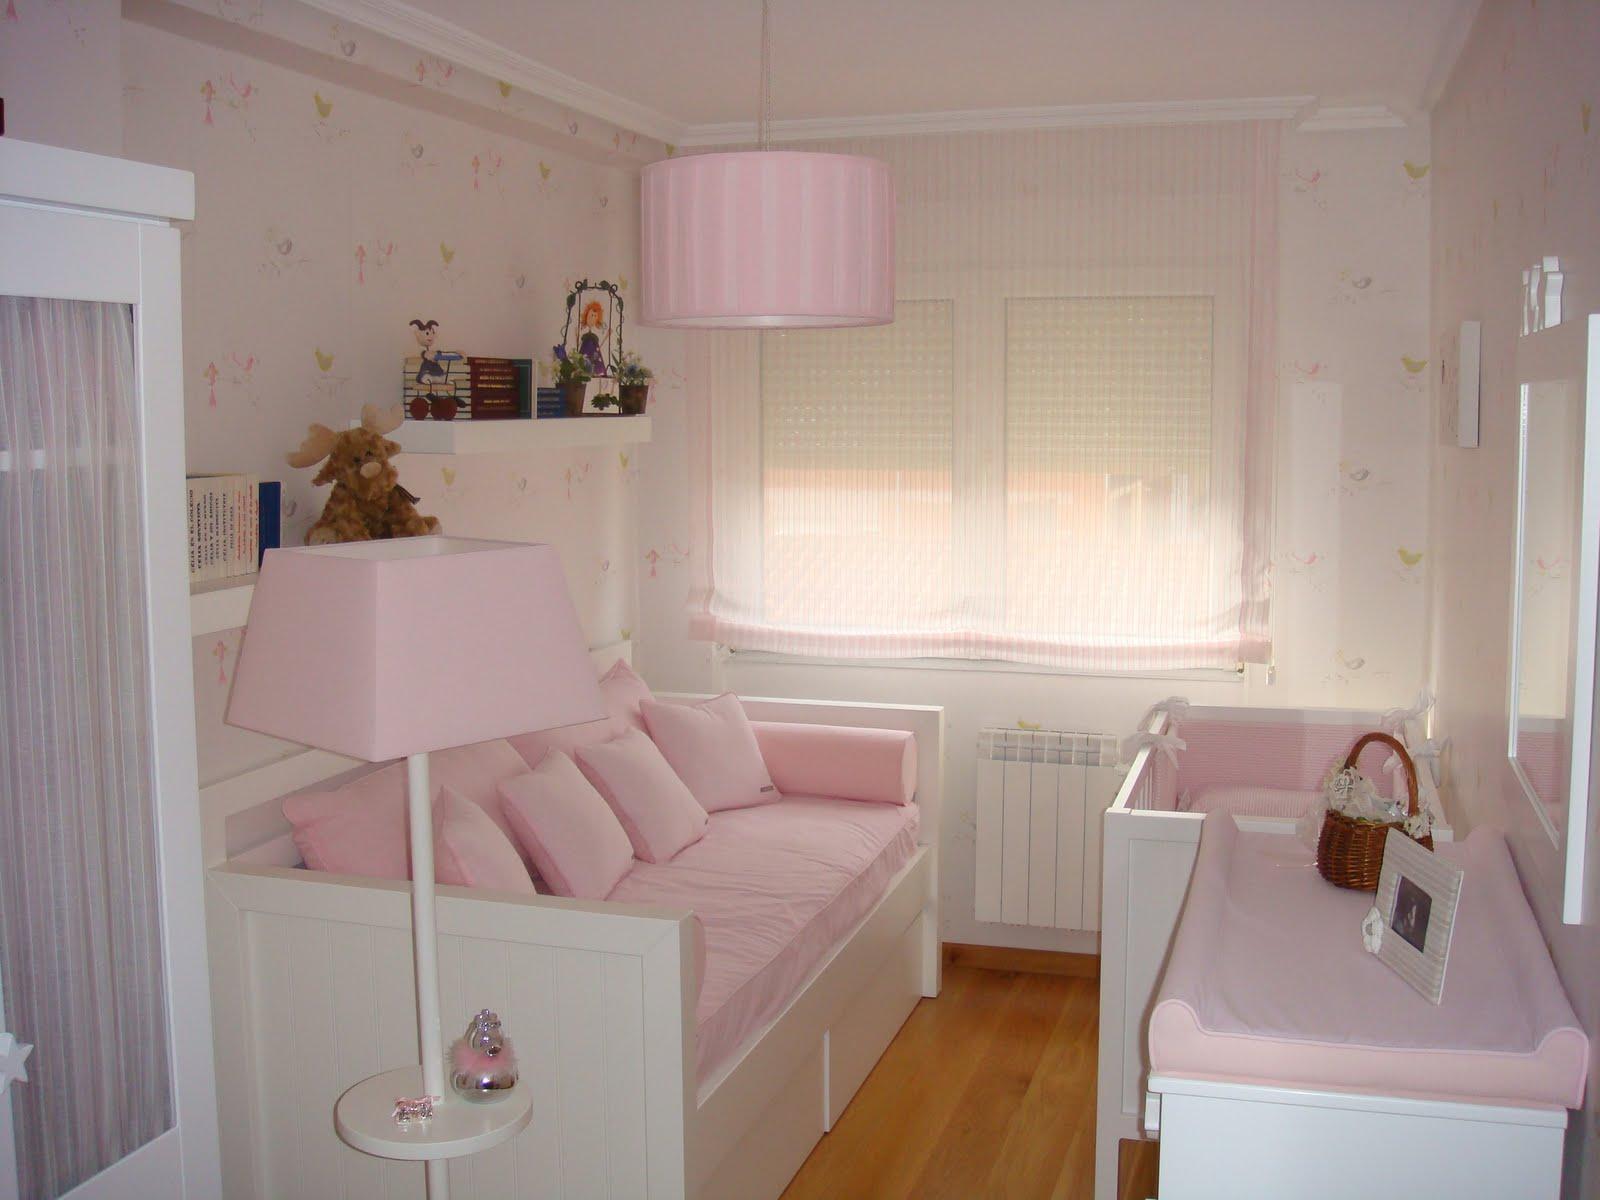 Ikea estores rosas